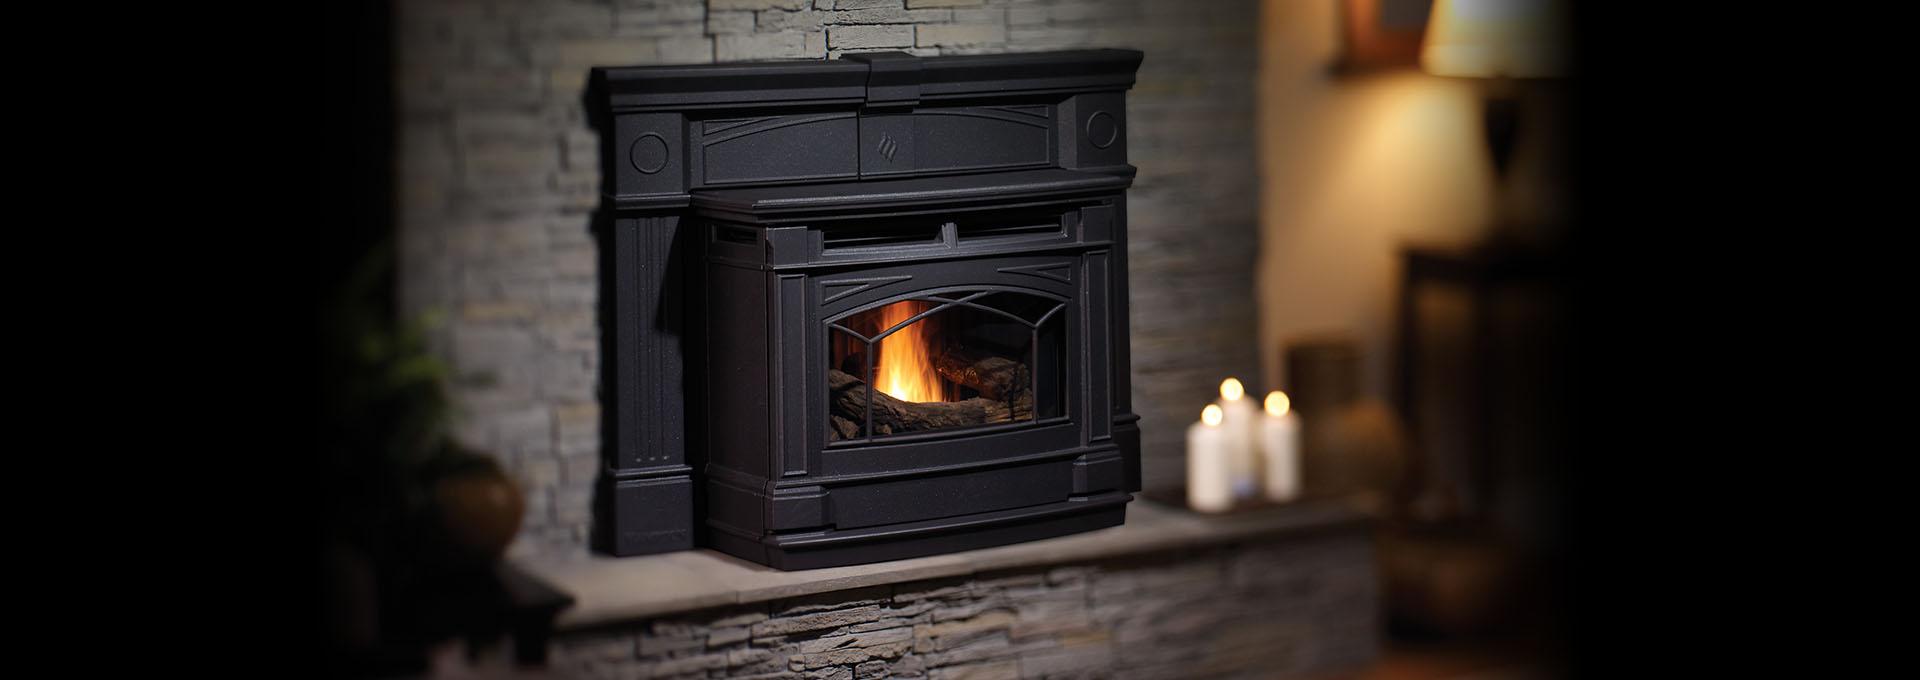 regency products gas fireplace inserts wood burning fireplaces rh regency fire com